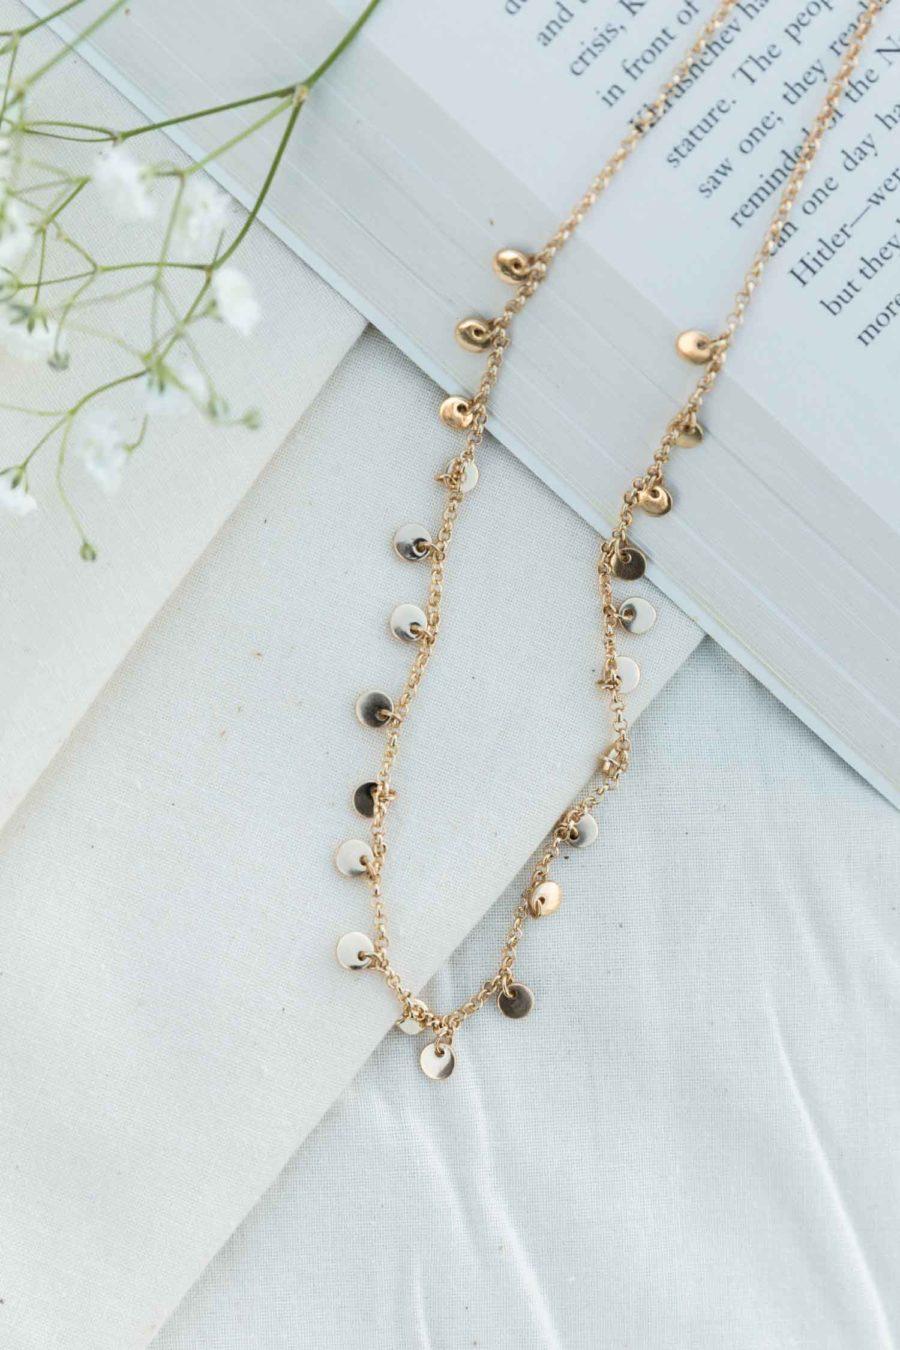 Mediterranean Sands Choker Necklace in Gold